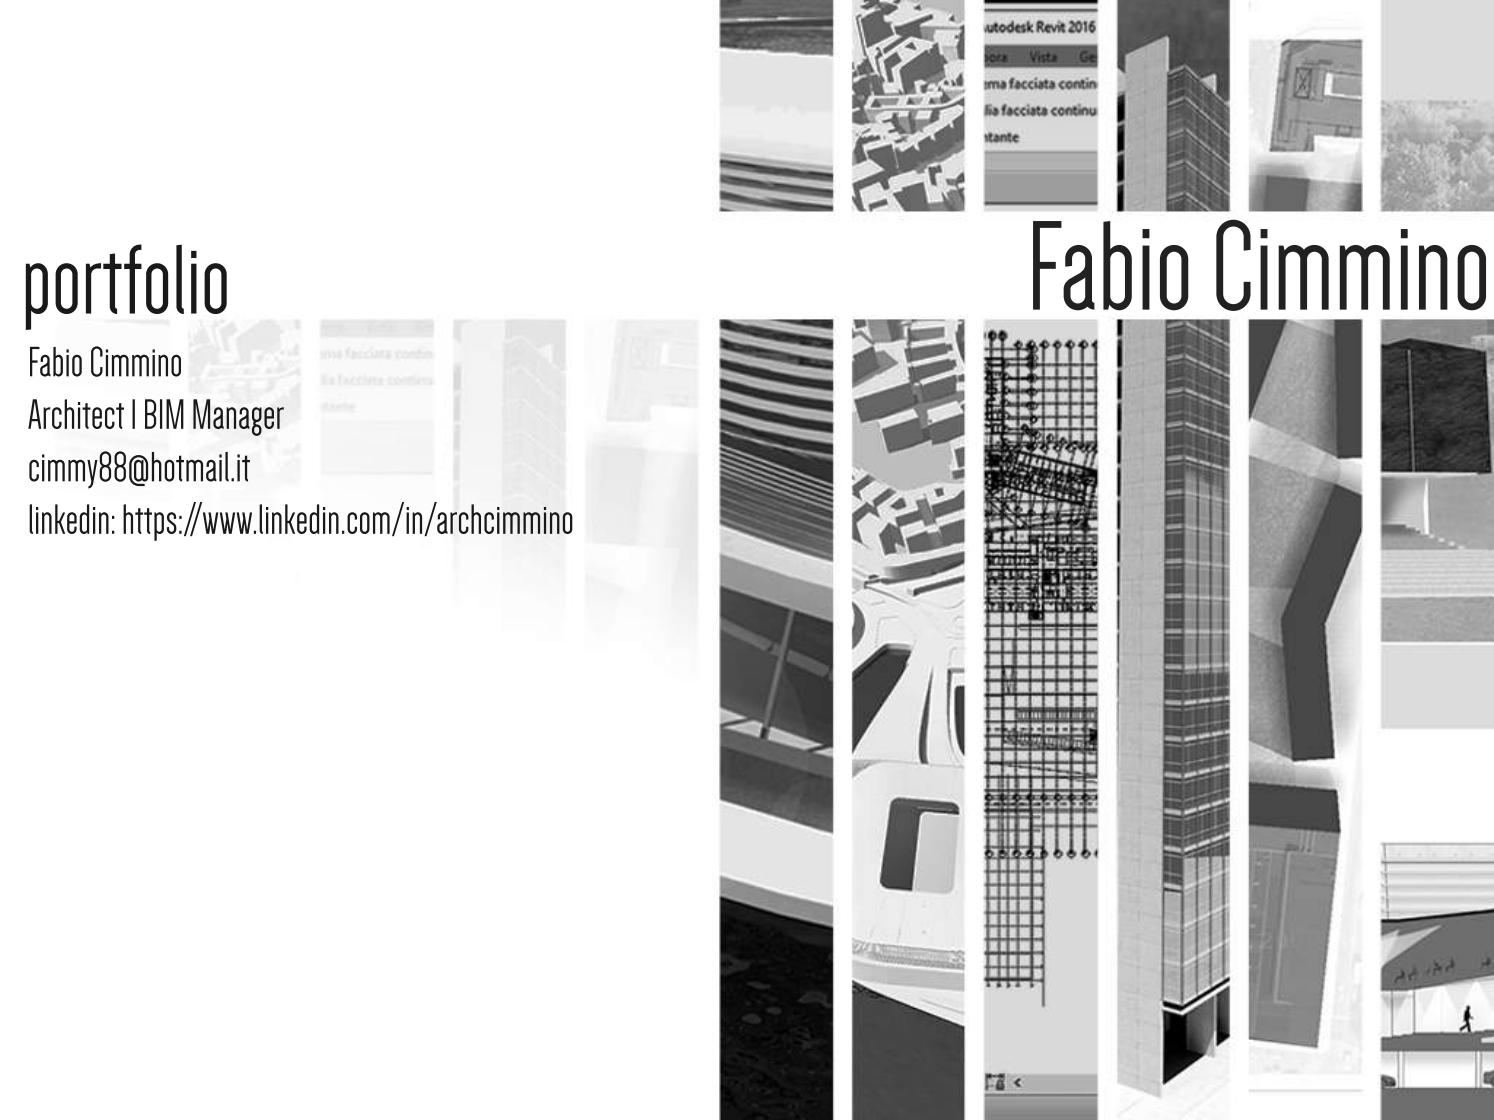 Portfolio Architect  BIM Manager by Fabio Cimmino  Issuu